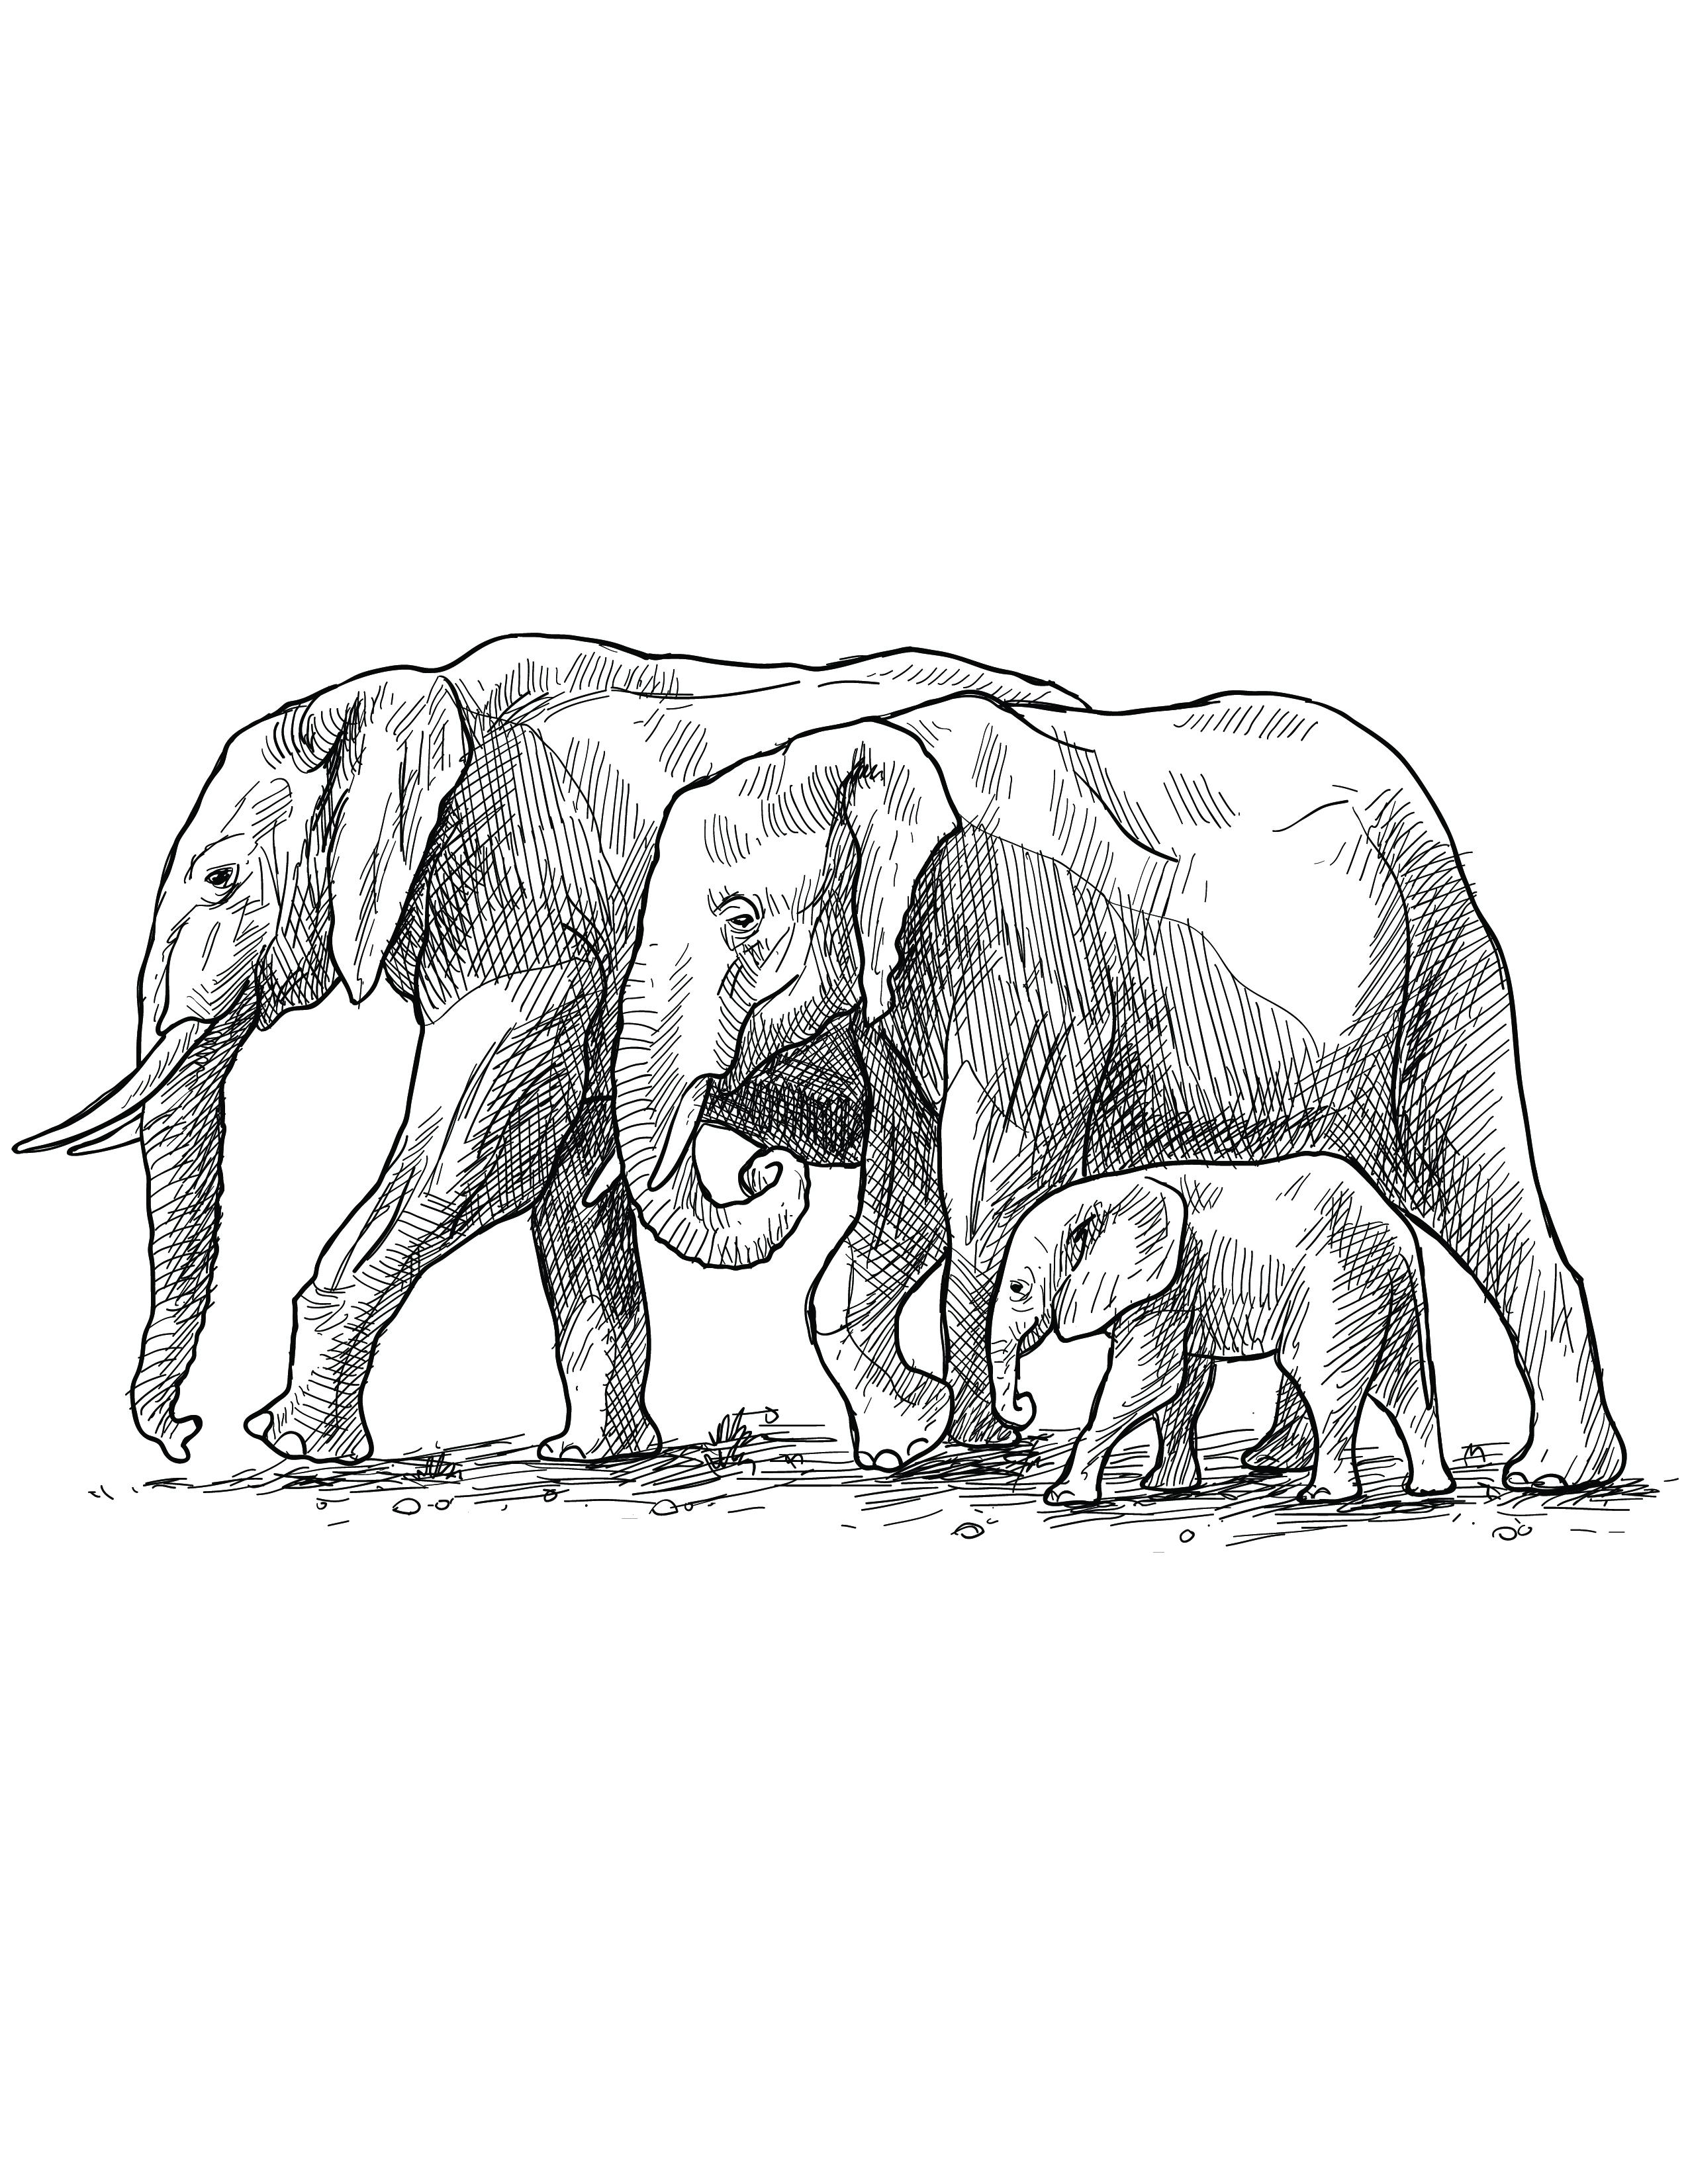 Coloriage Poisson Elephant.Coloriage Grayscale Gratuit Famille Elephant Artherapie Ca